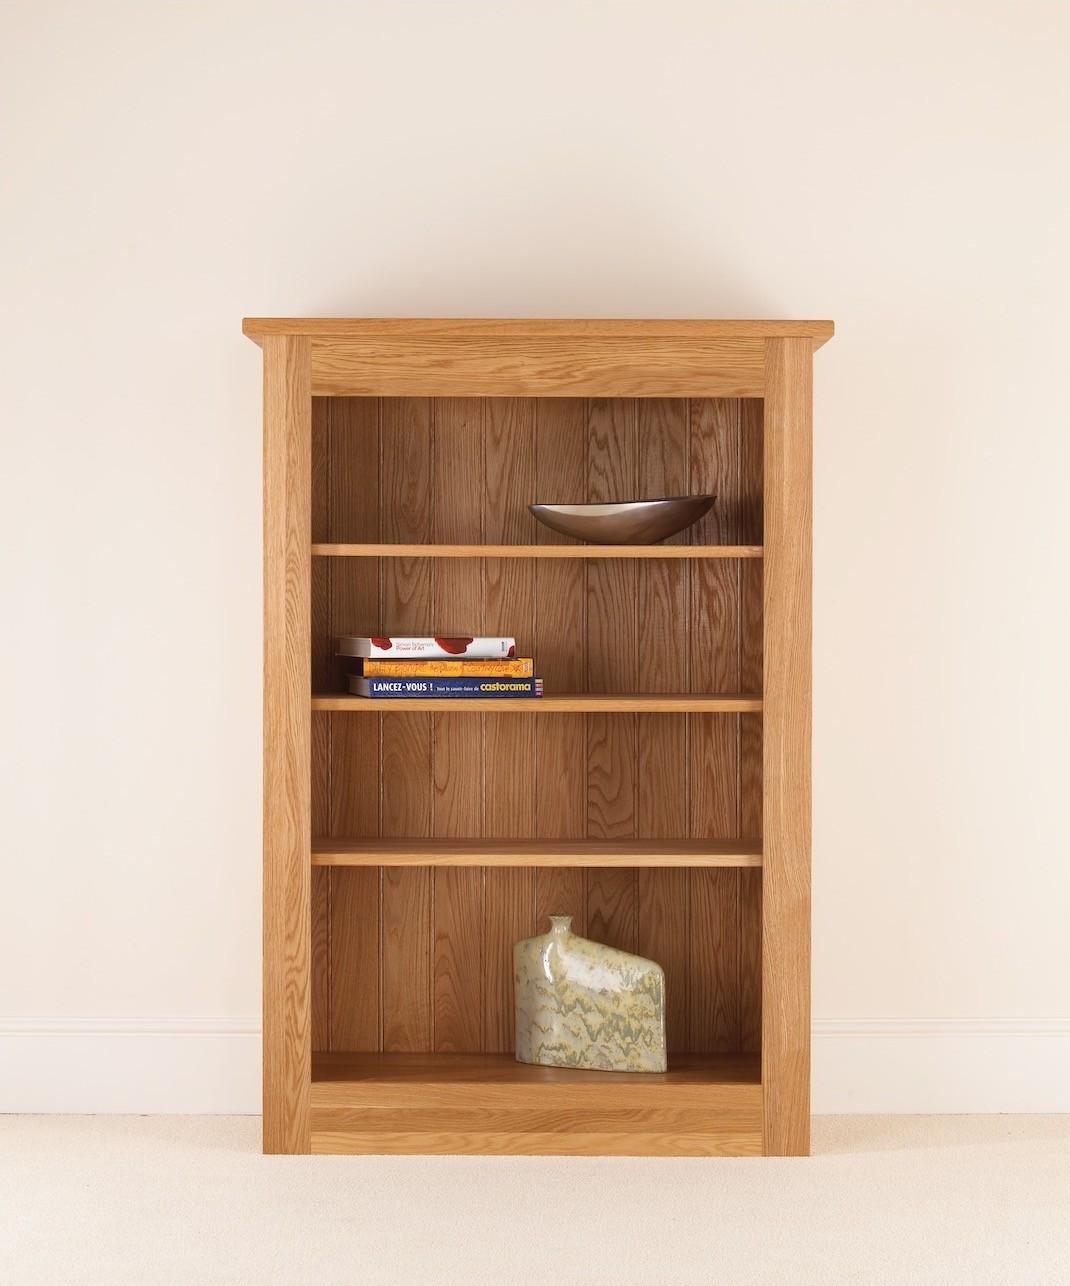 Quercus Solid Oak Bookcase 54 38 12